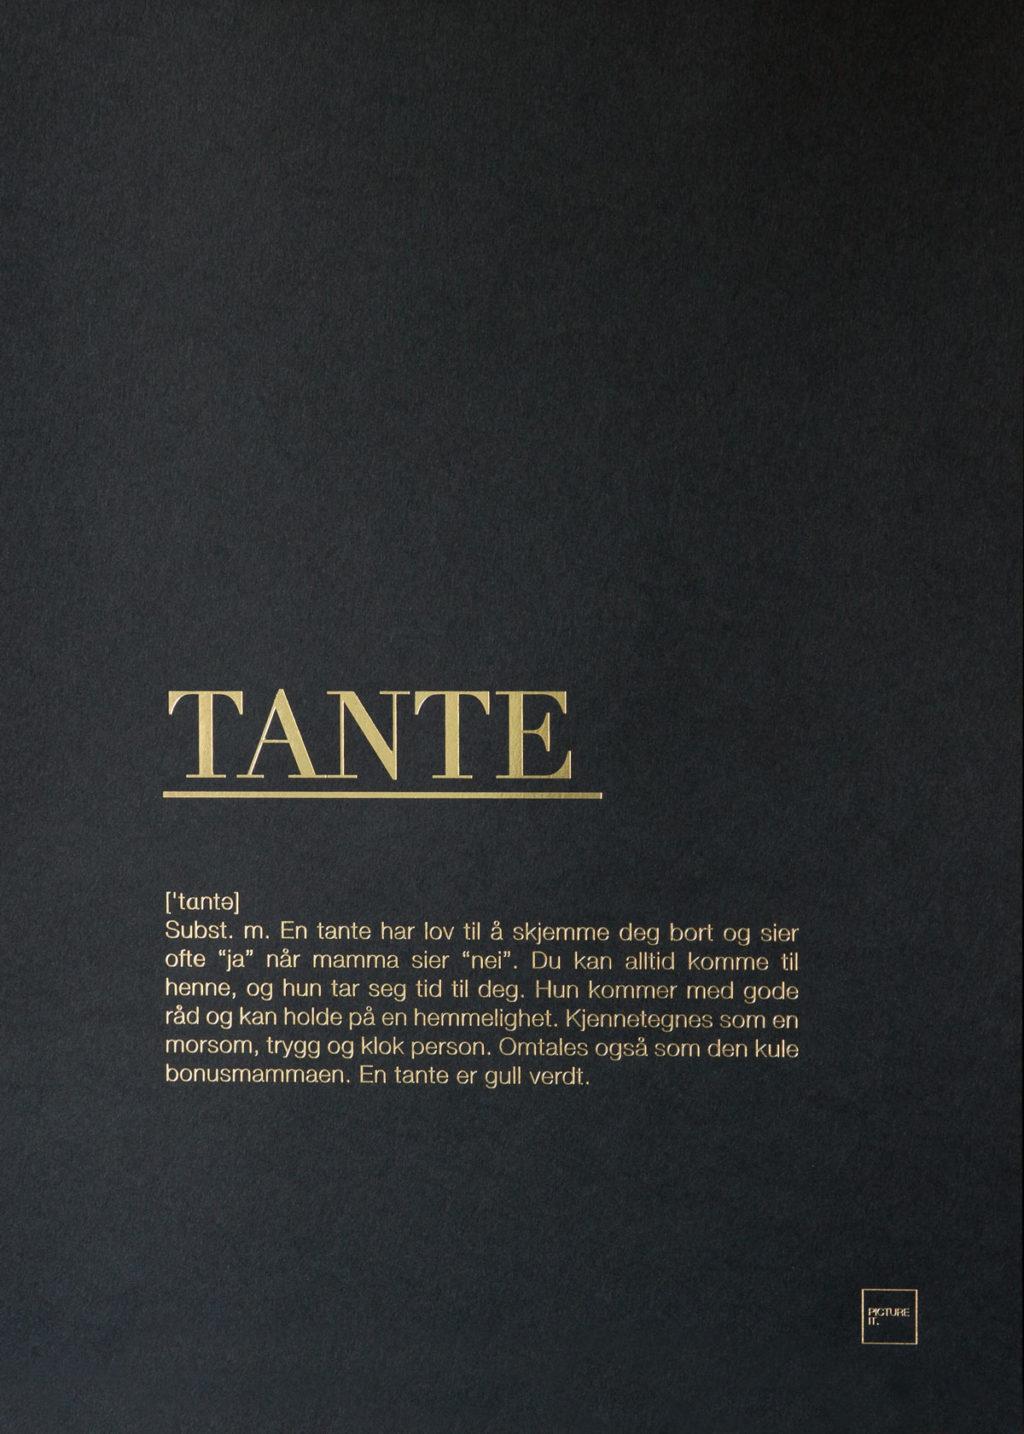 TANTE gull poster